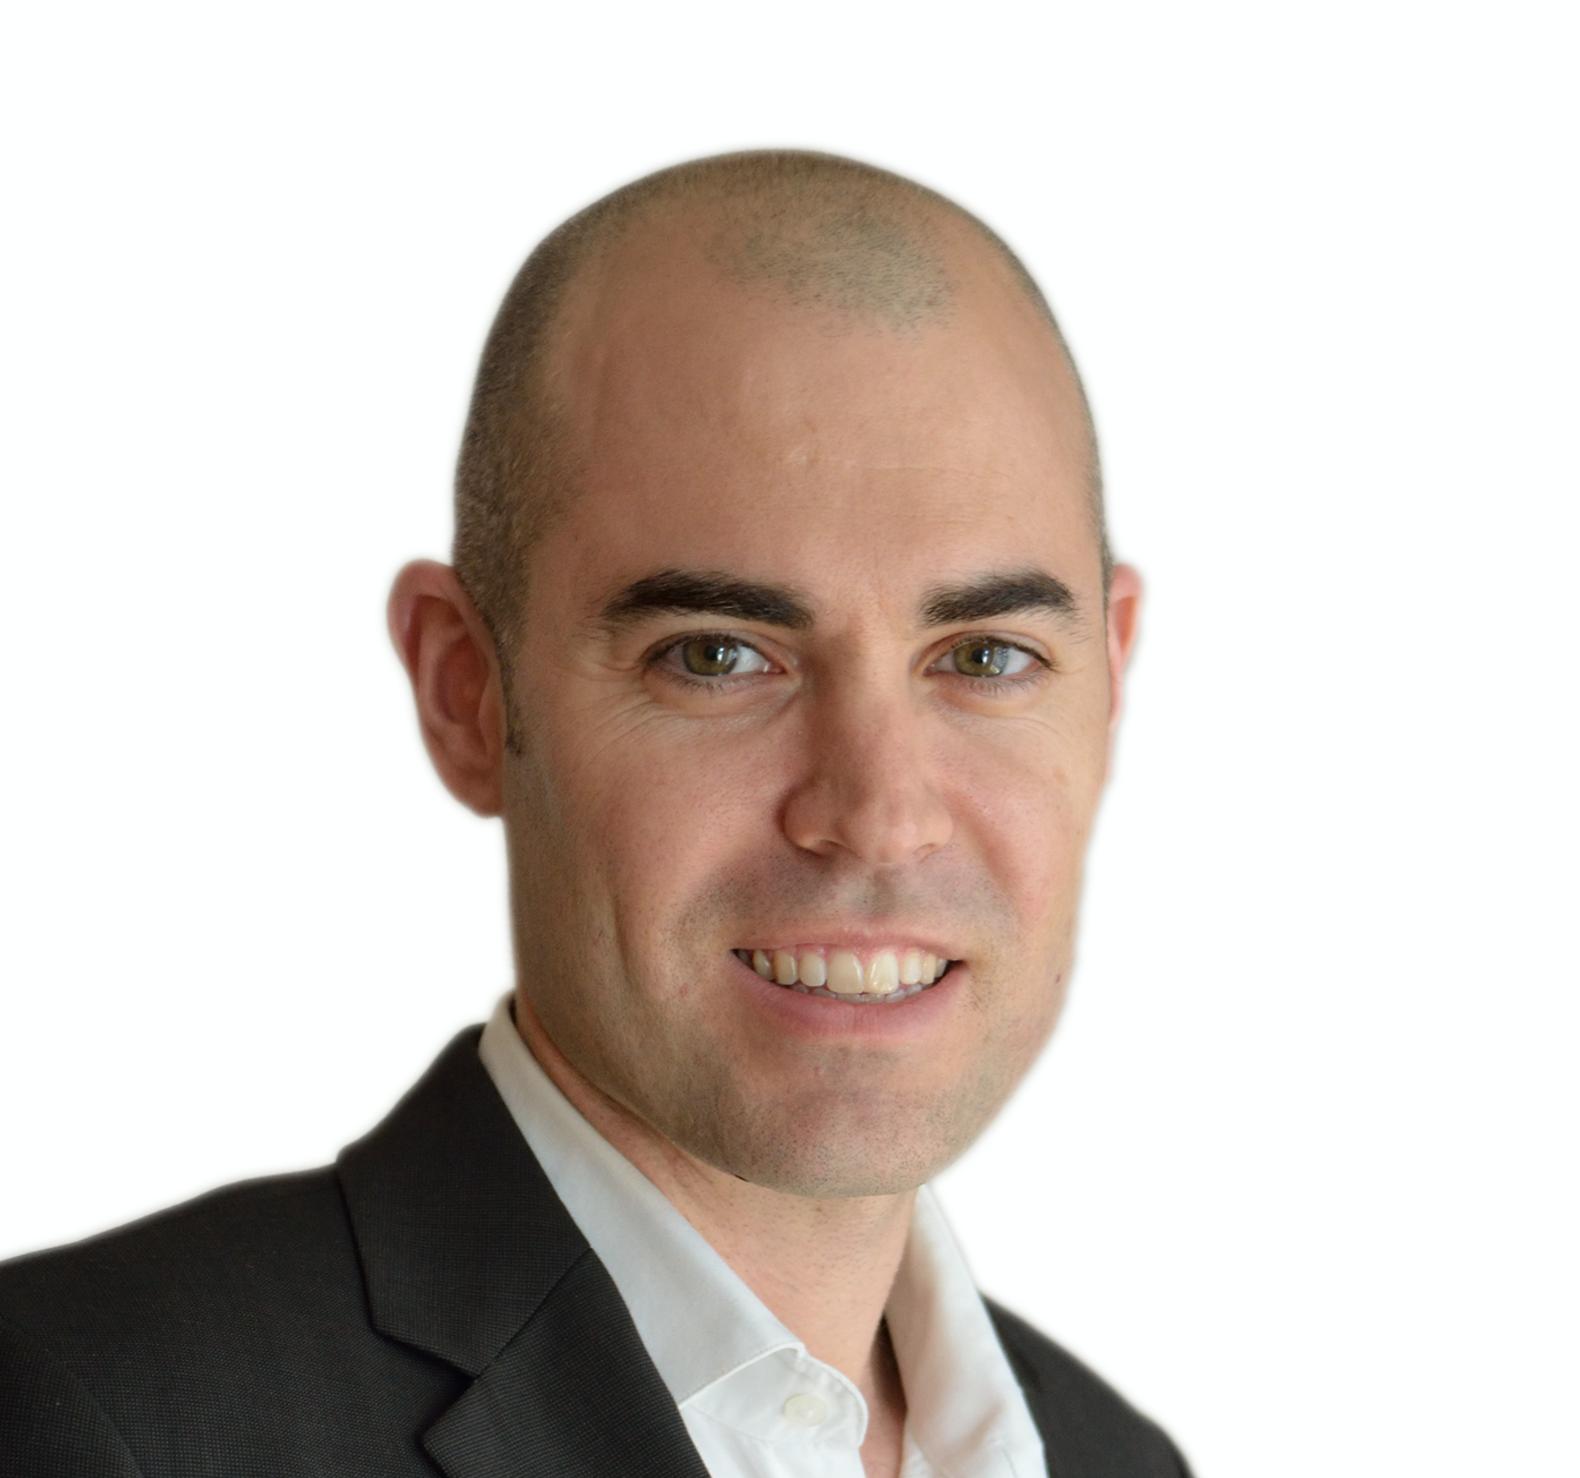 "<a href=""https://www.linkedin.com/in/ernestlara ""target=""_blank"">Ernest Lara →</a><strong></strong><strong>Executive Director | Richi Entrepreneurs</strong>"